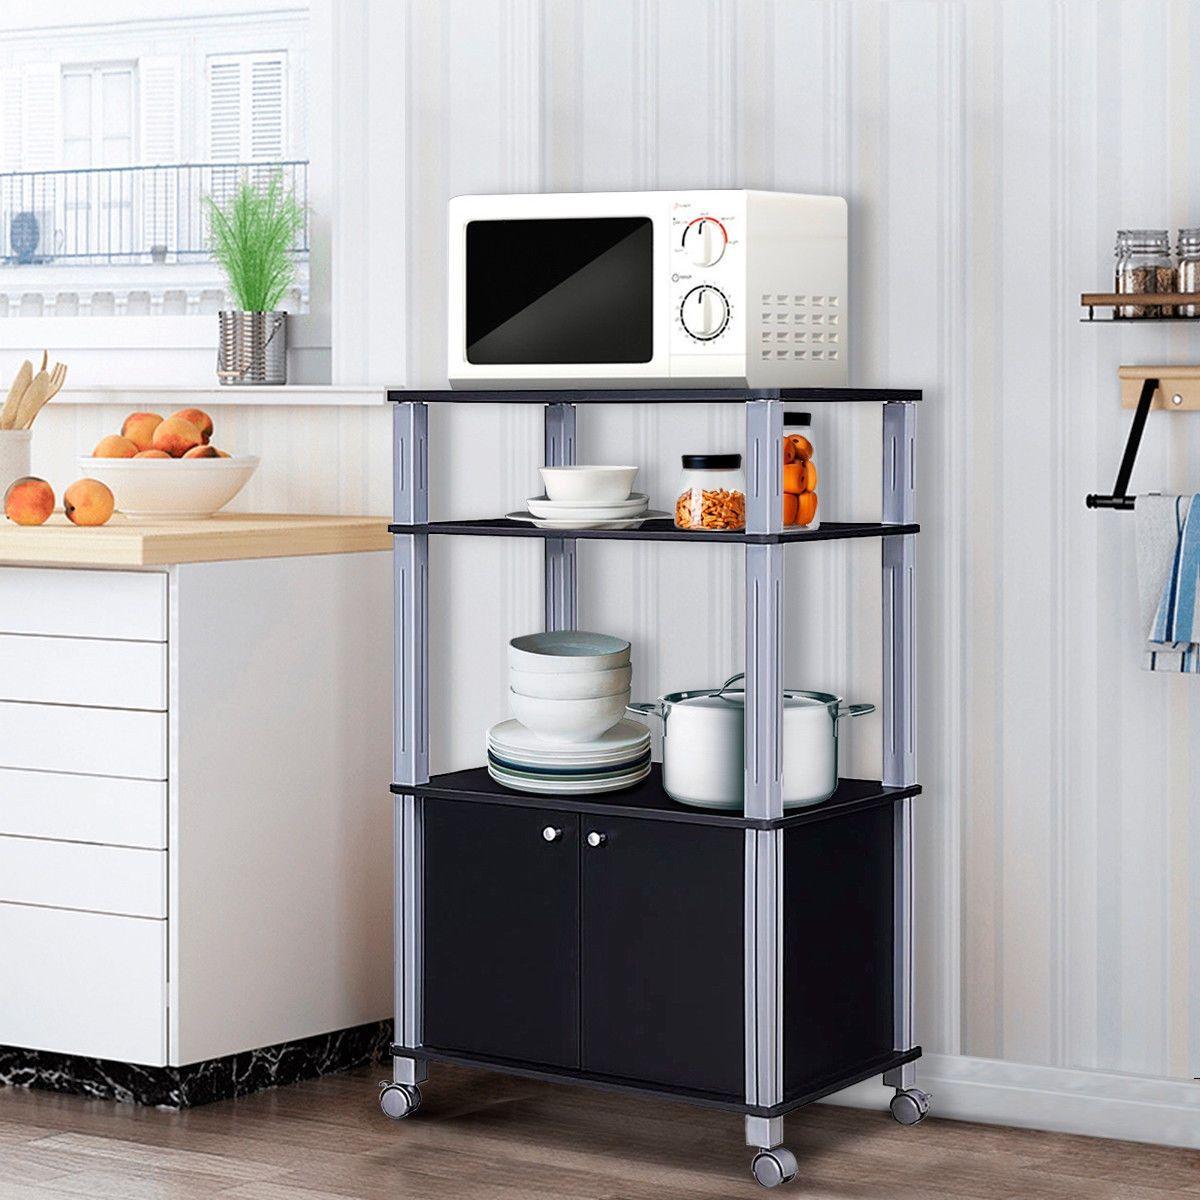 Bakers Rack Microwave Stand Rolling Storage Cart Black Microwave